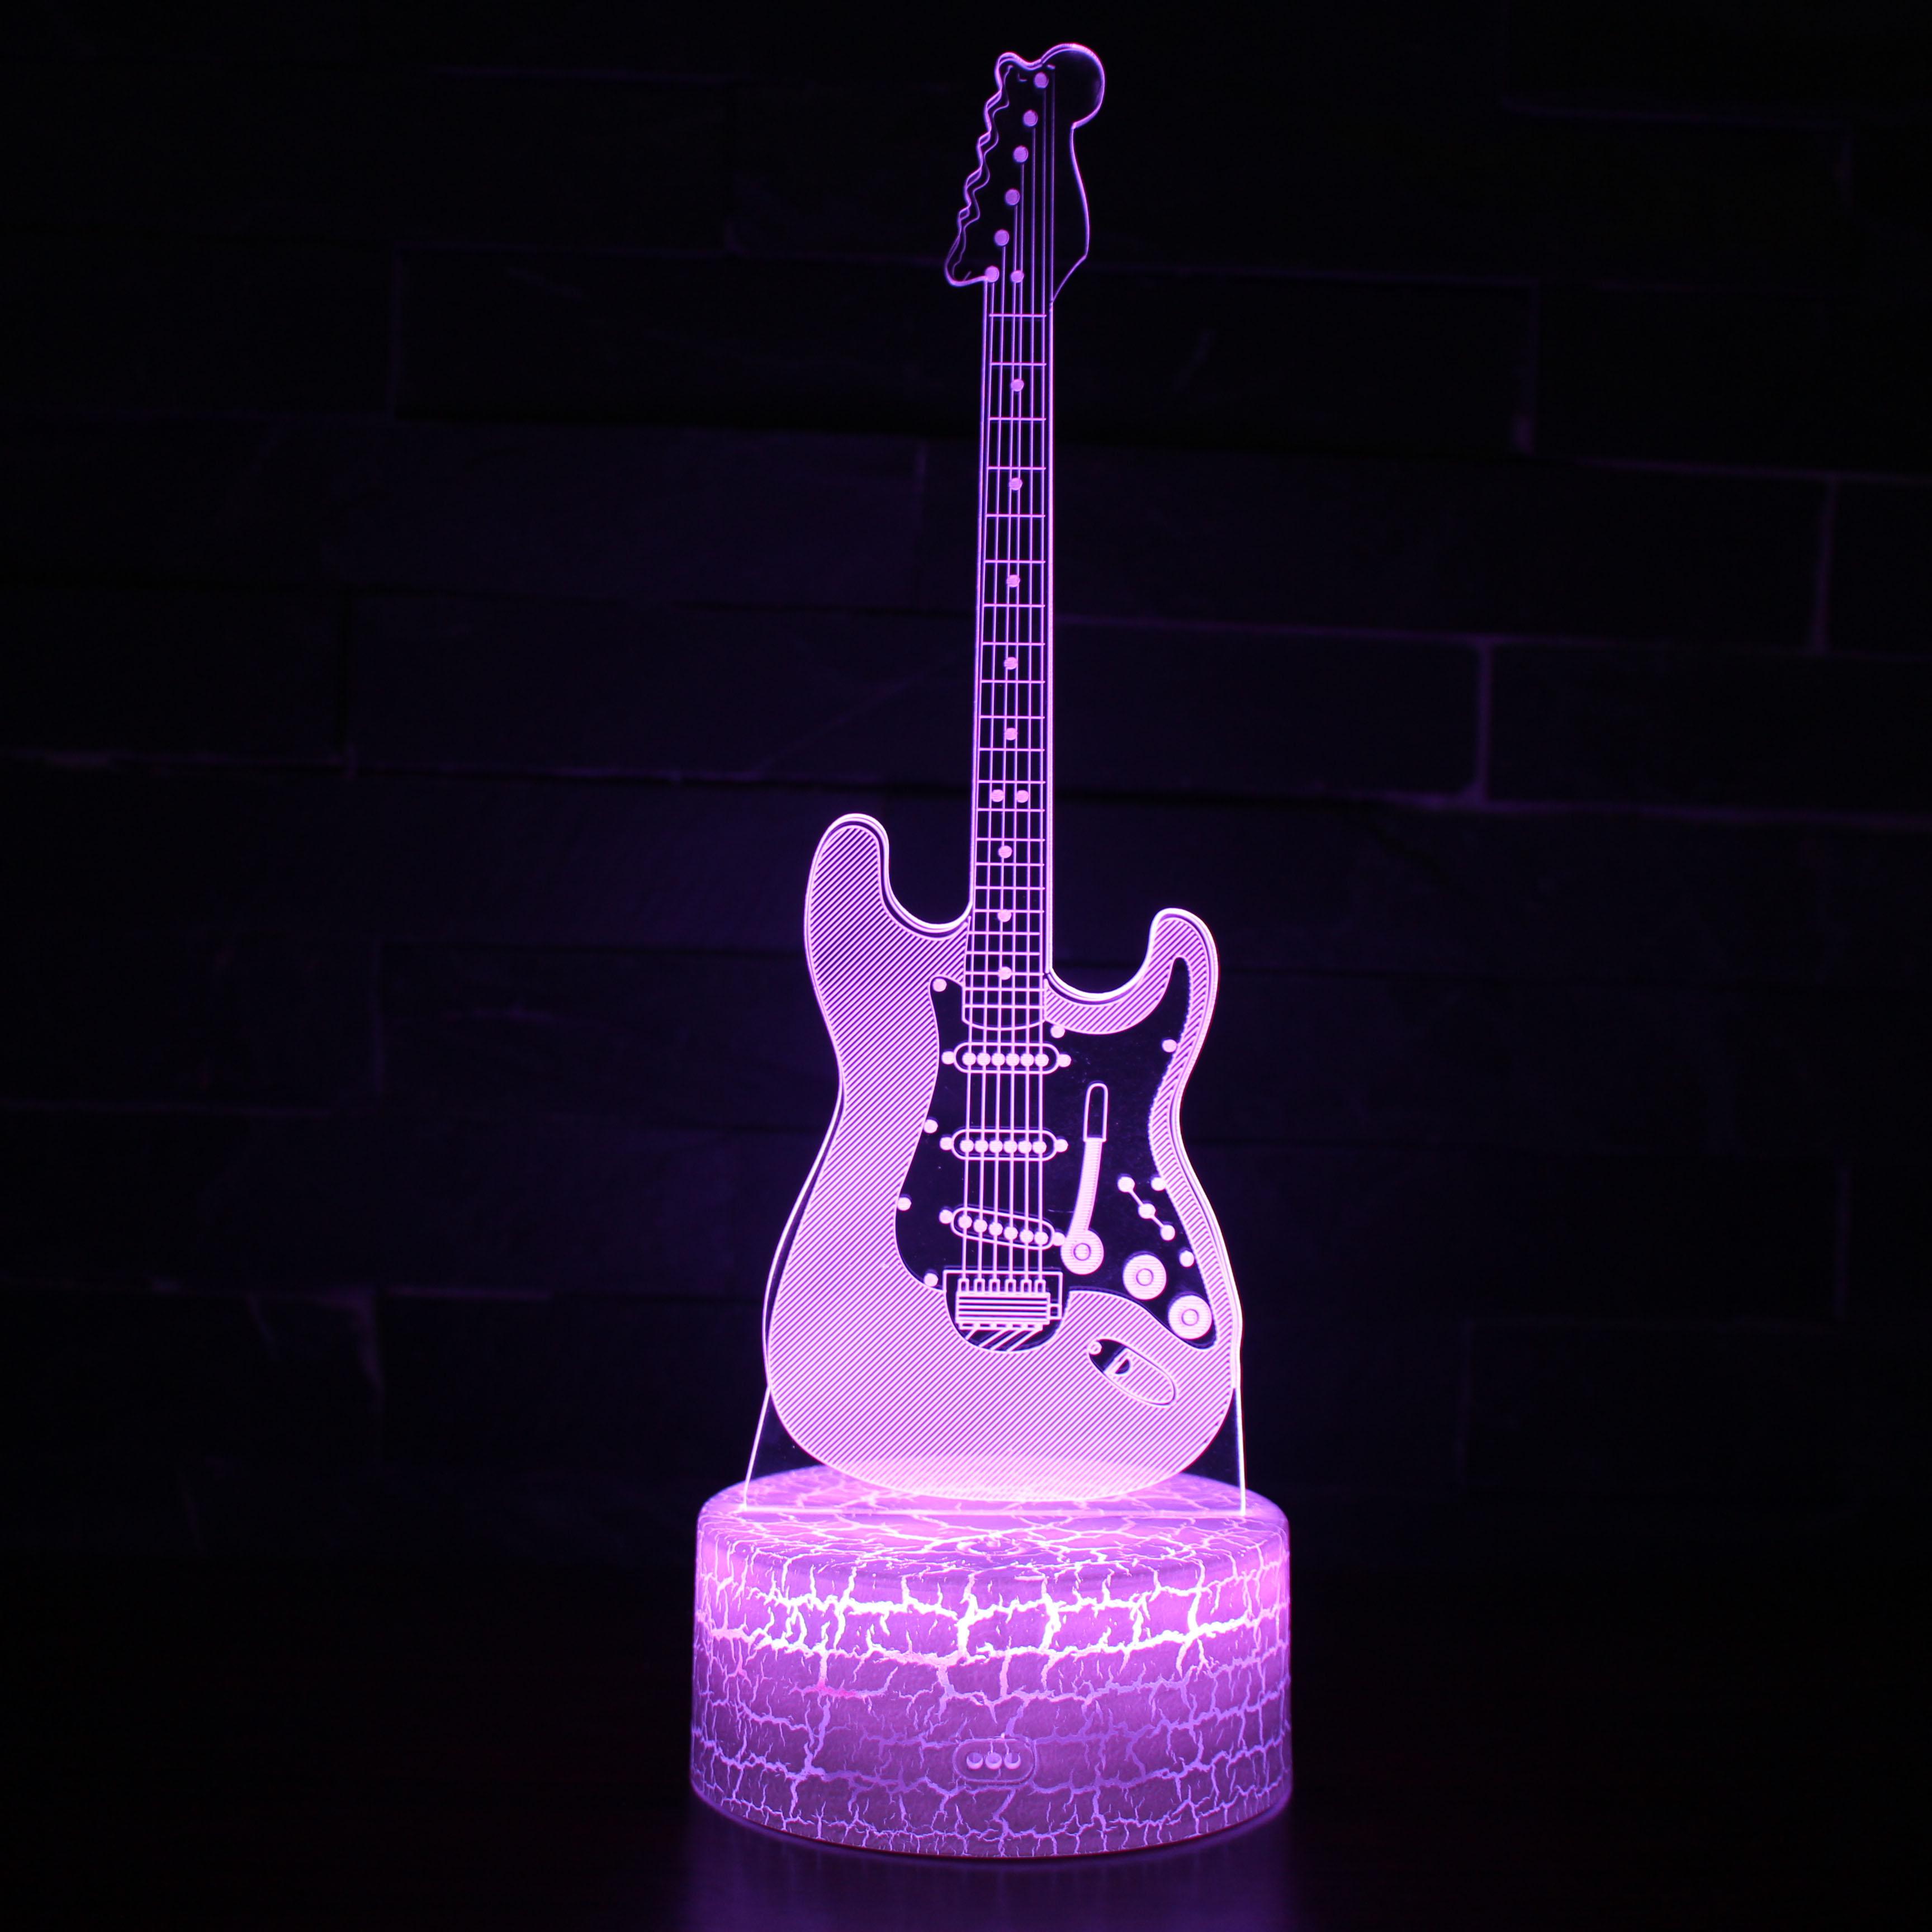 3d立體吉他充電led個性創意裝飾臺燈卧室七彩氛圍小夜燈生日禮品